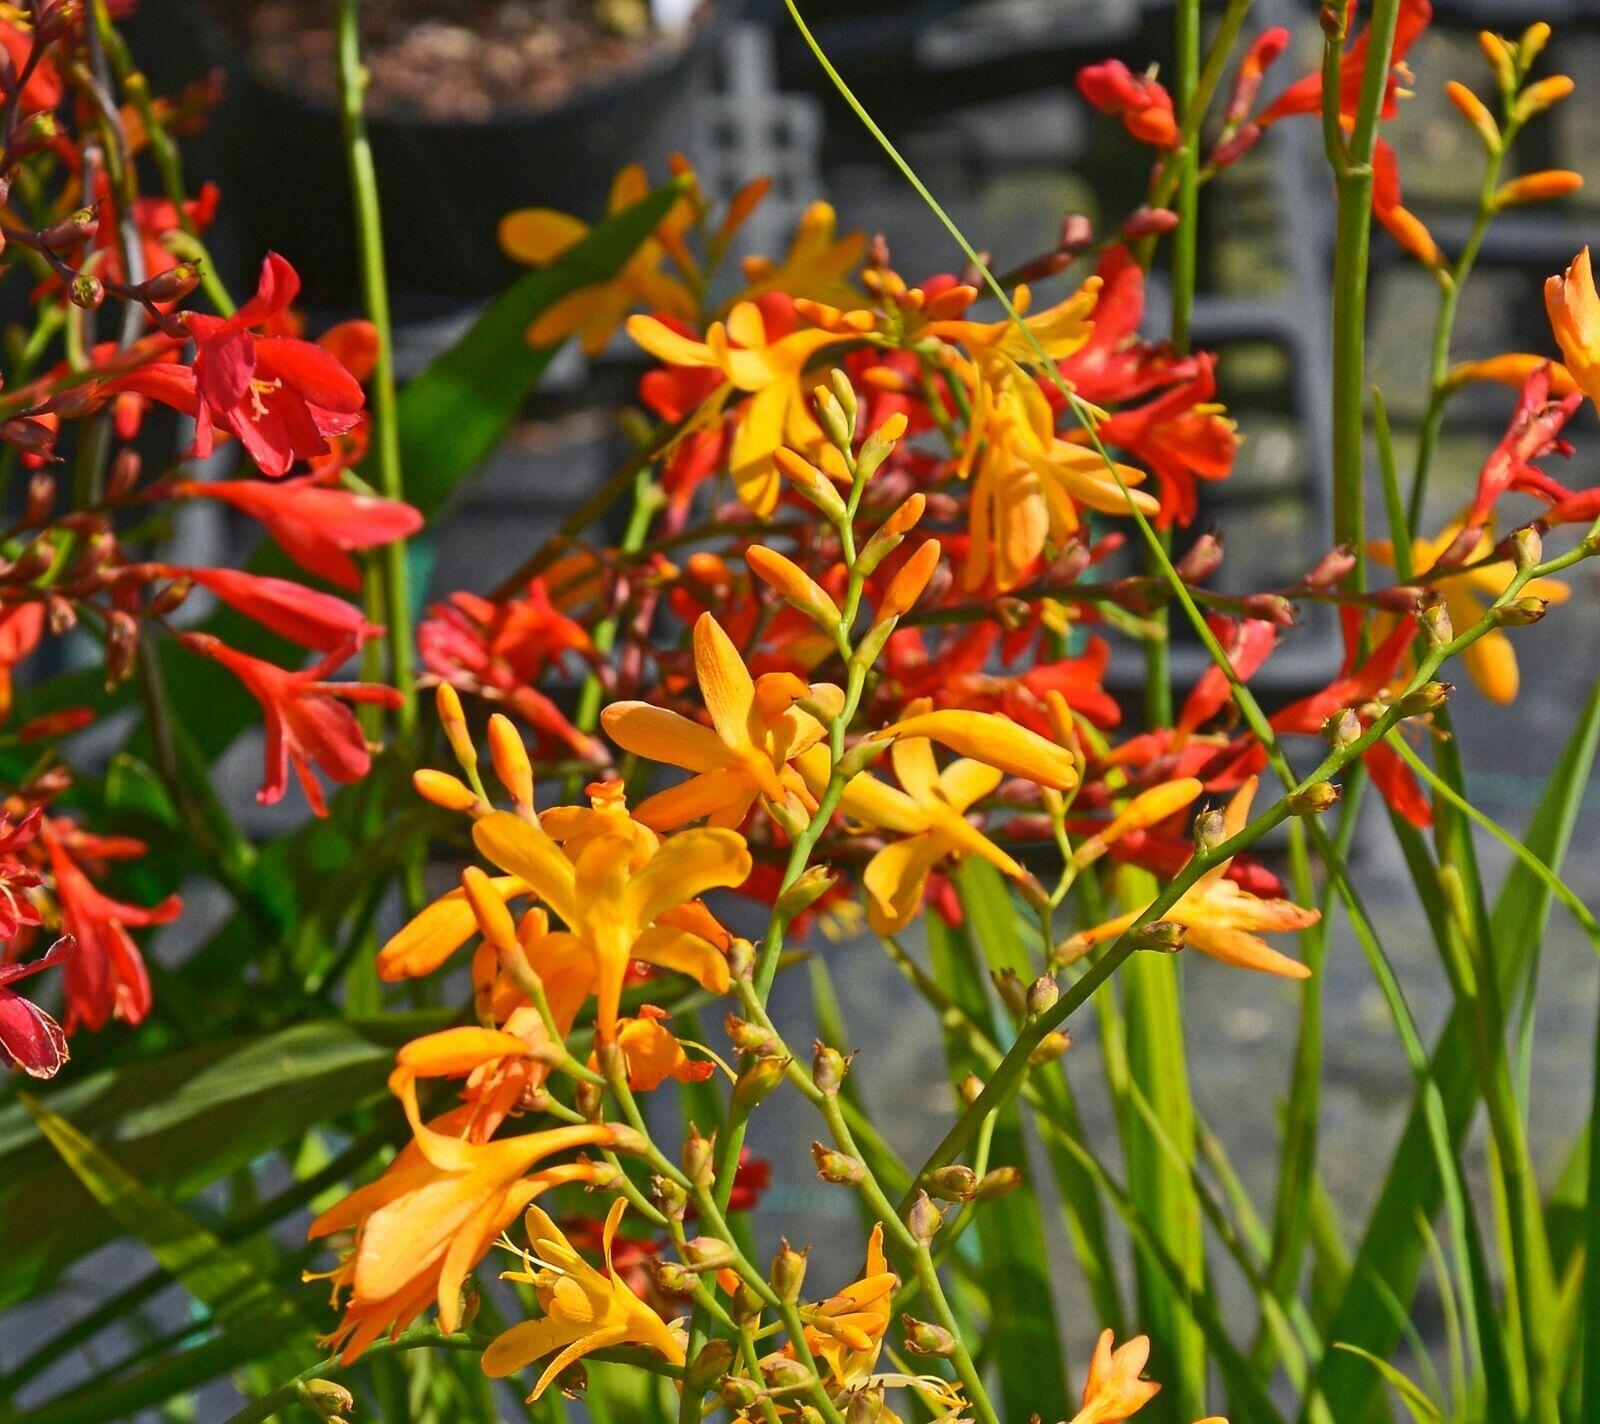 50x Crocosmia Mixed Colours Summer Flowering Bulbs Garden Perennial Flower Corms